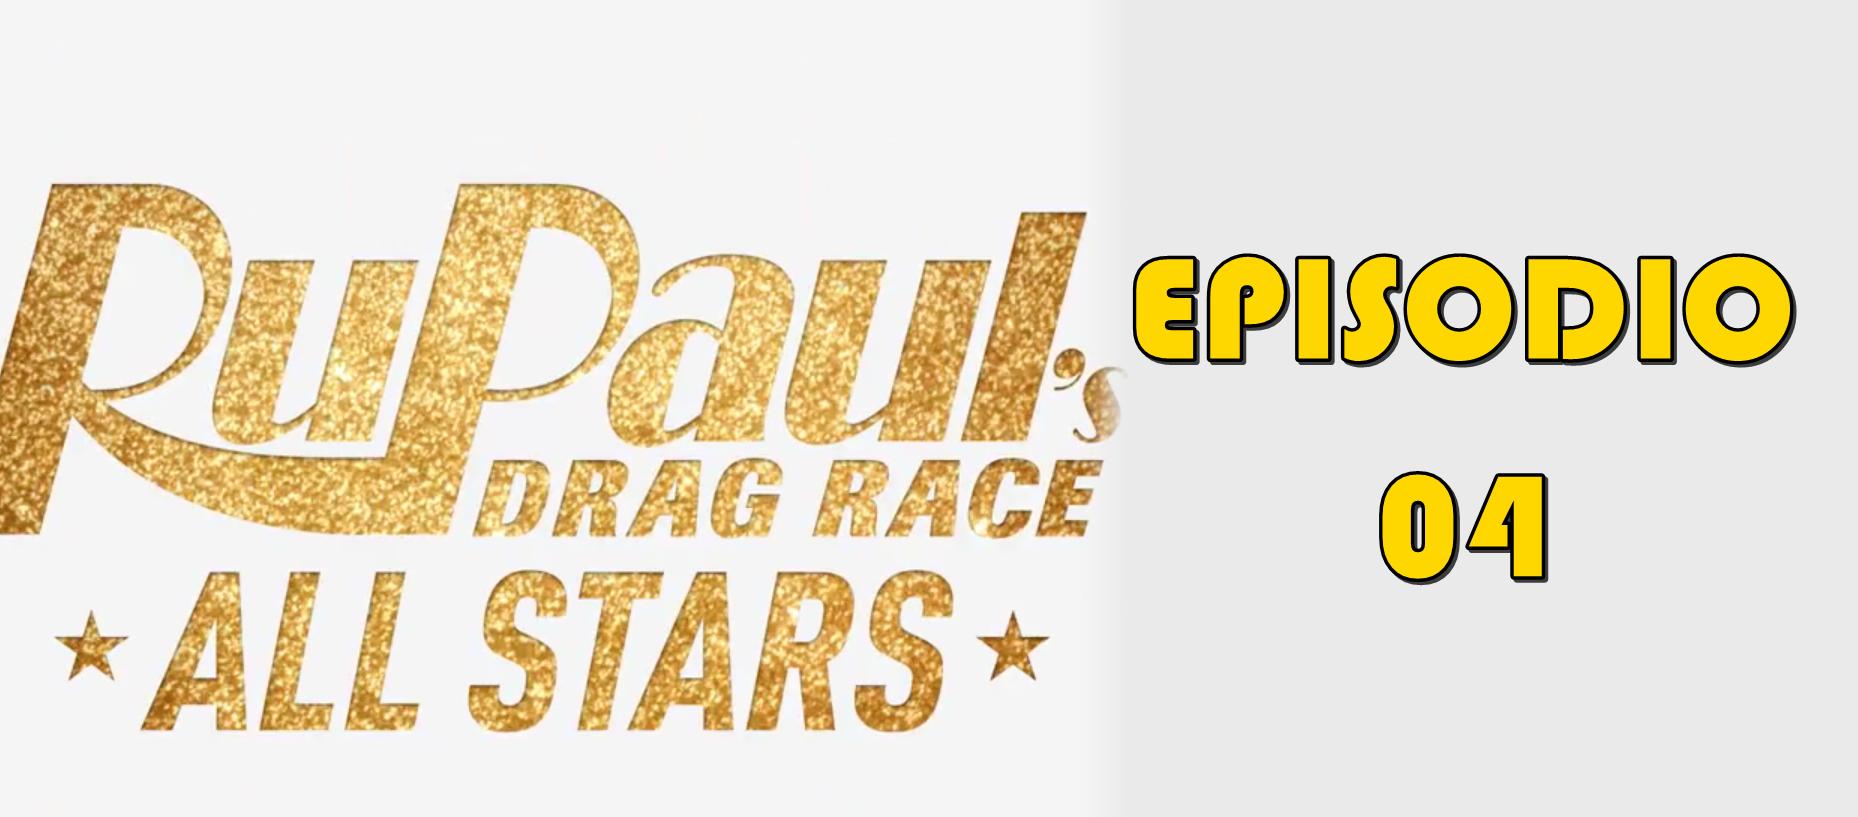 Rupaul´s Drag Race All Stars 3 Episodio 04